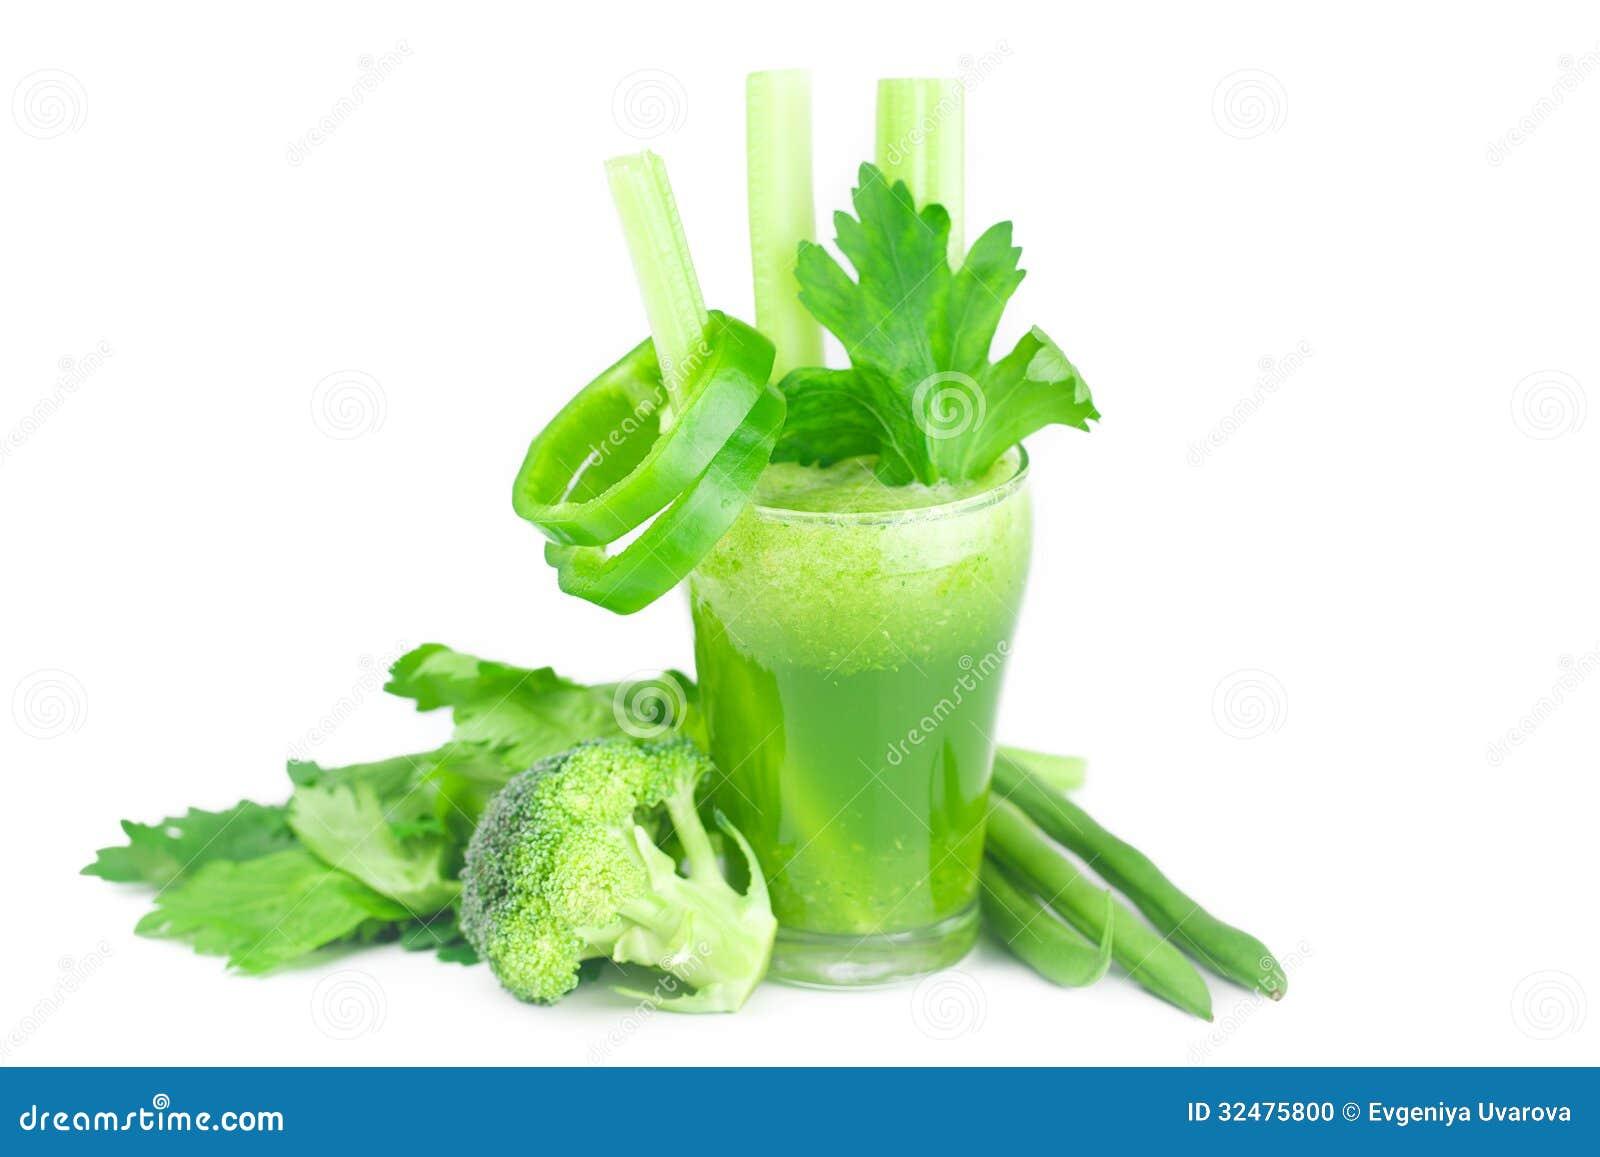 how to prepare celery juice